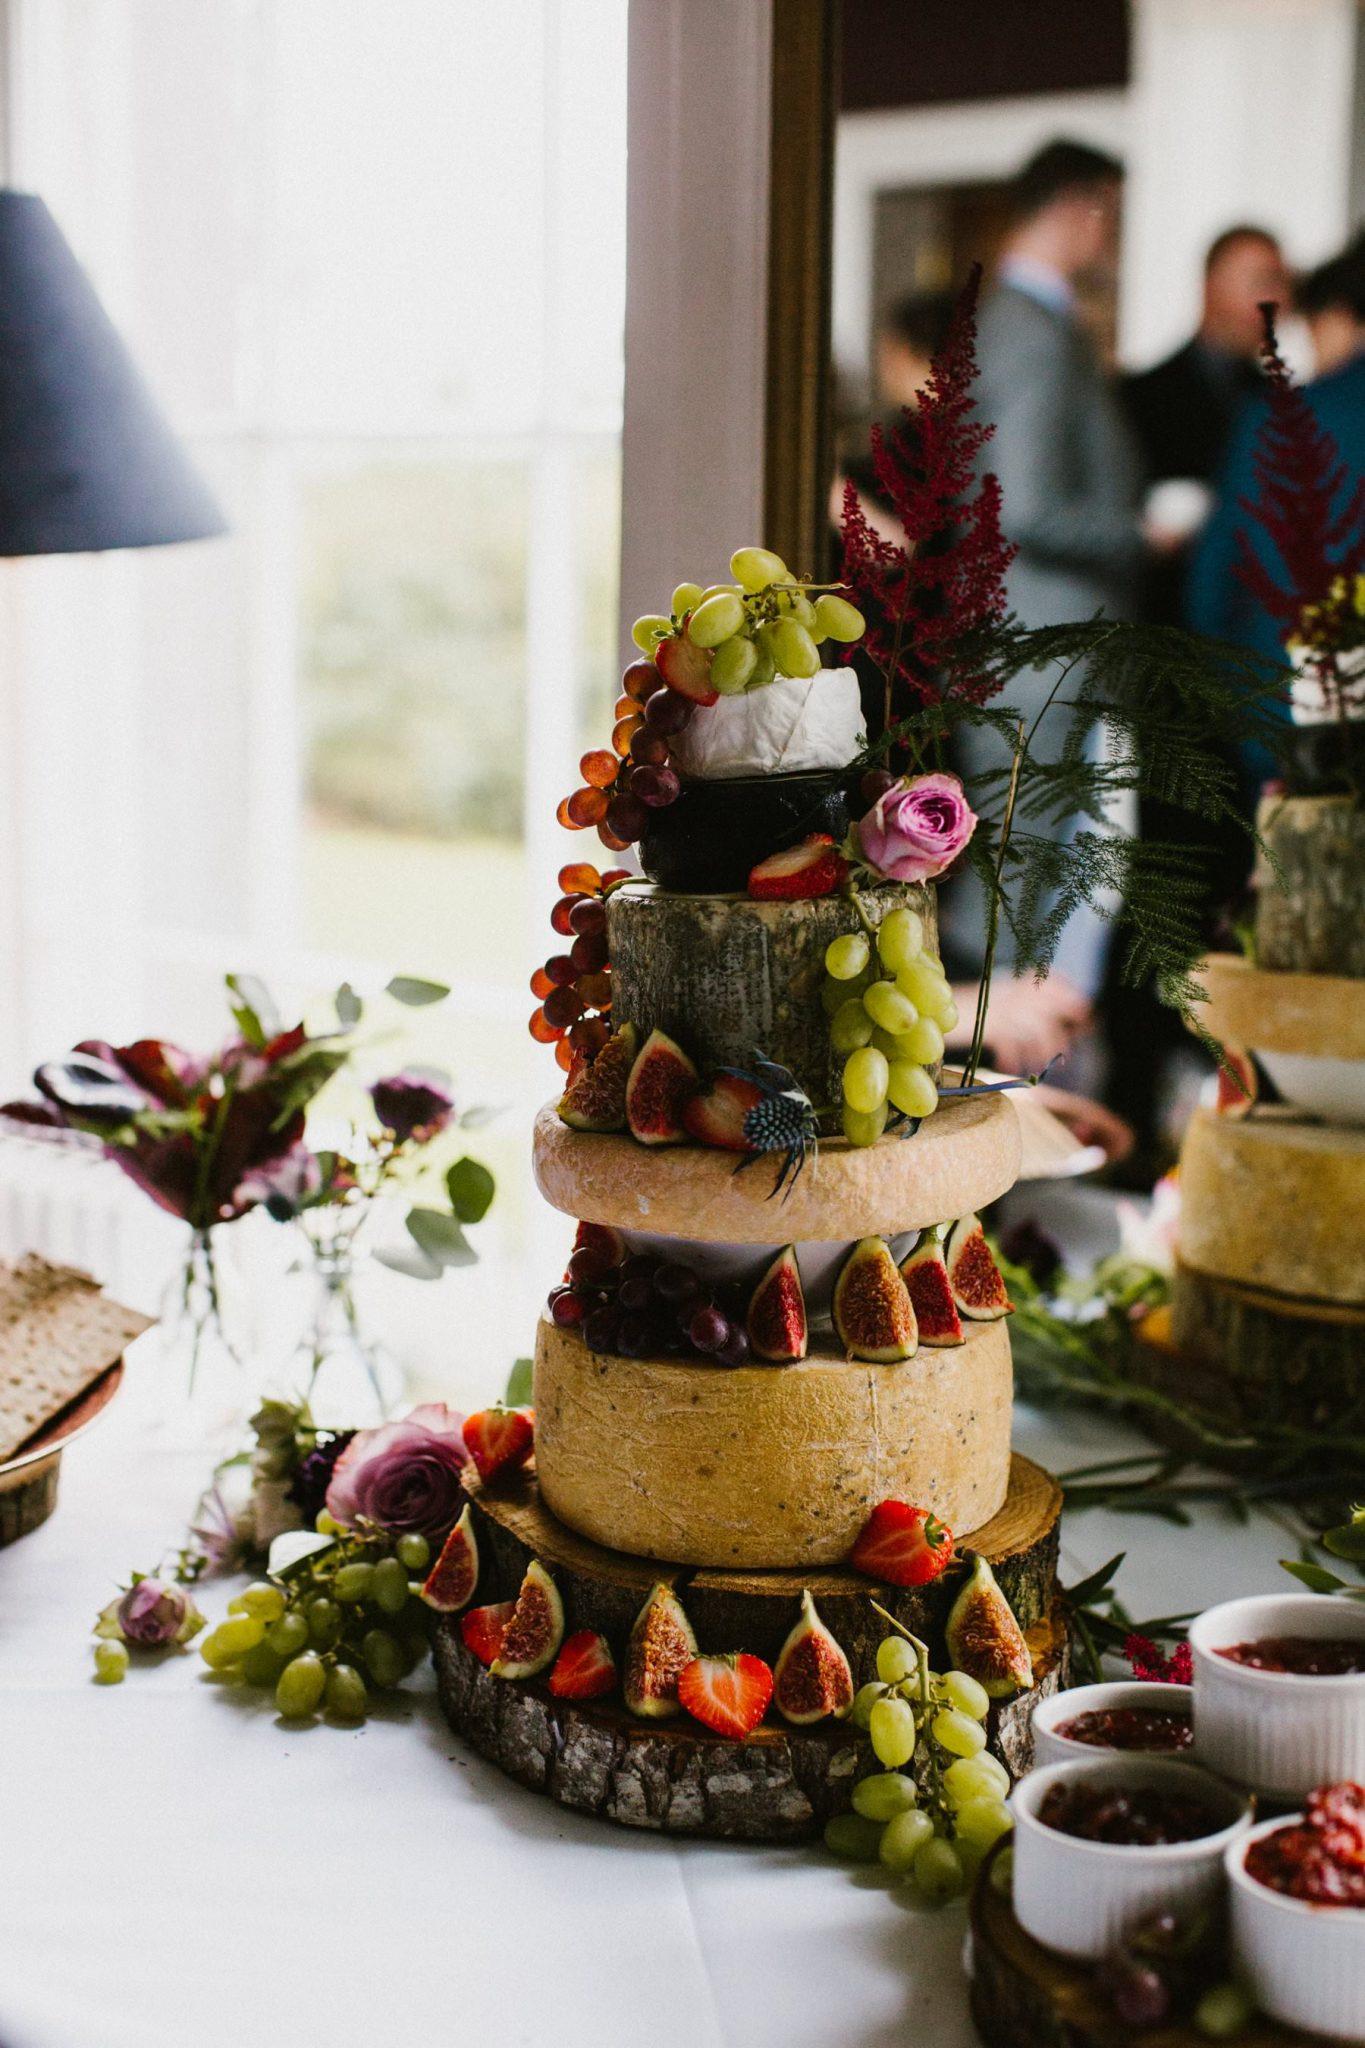 wedding cake made of cheese for same sex wedding